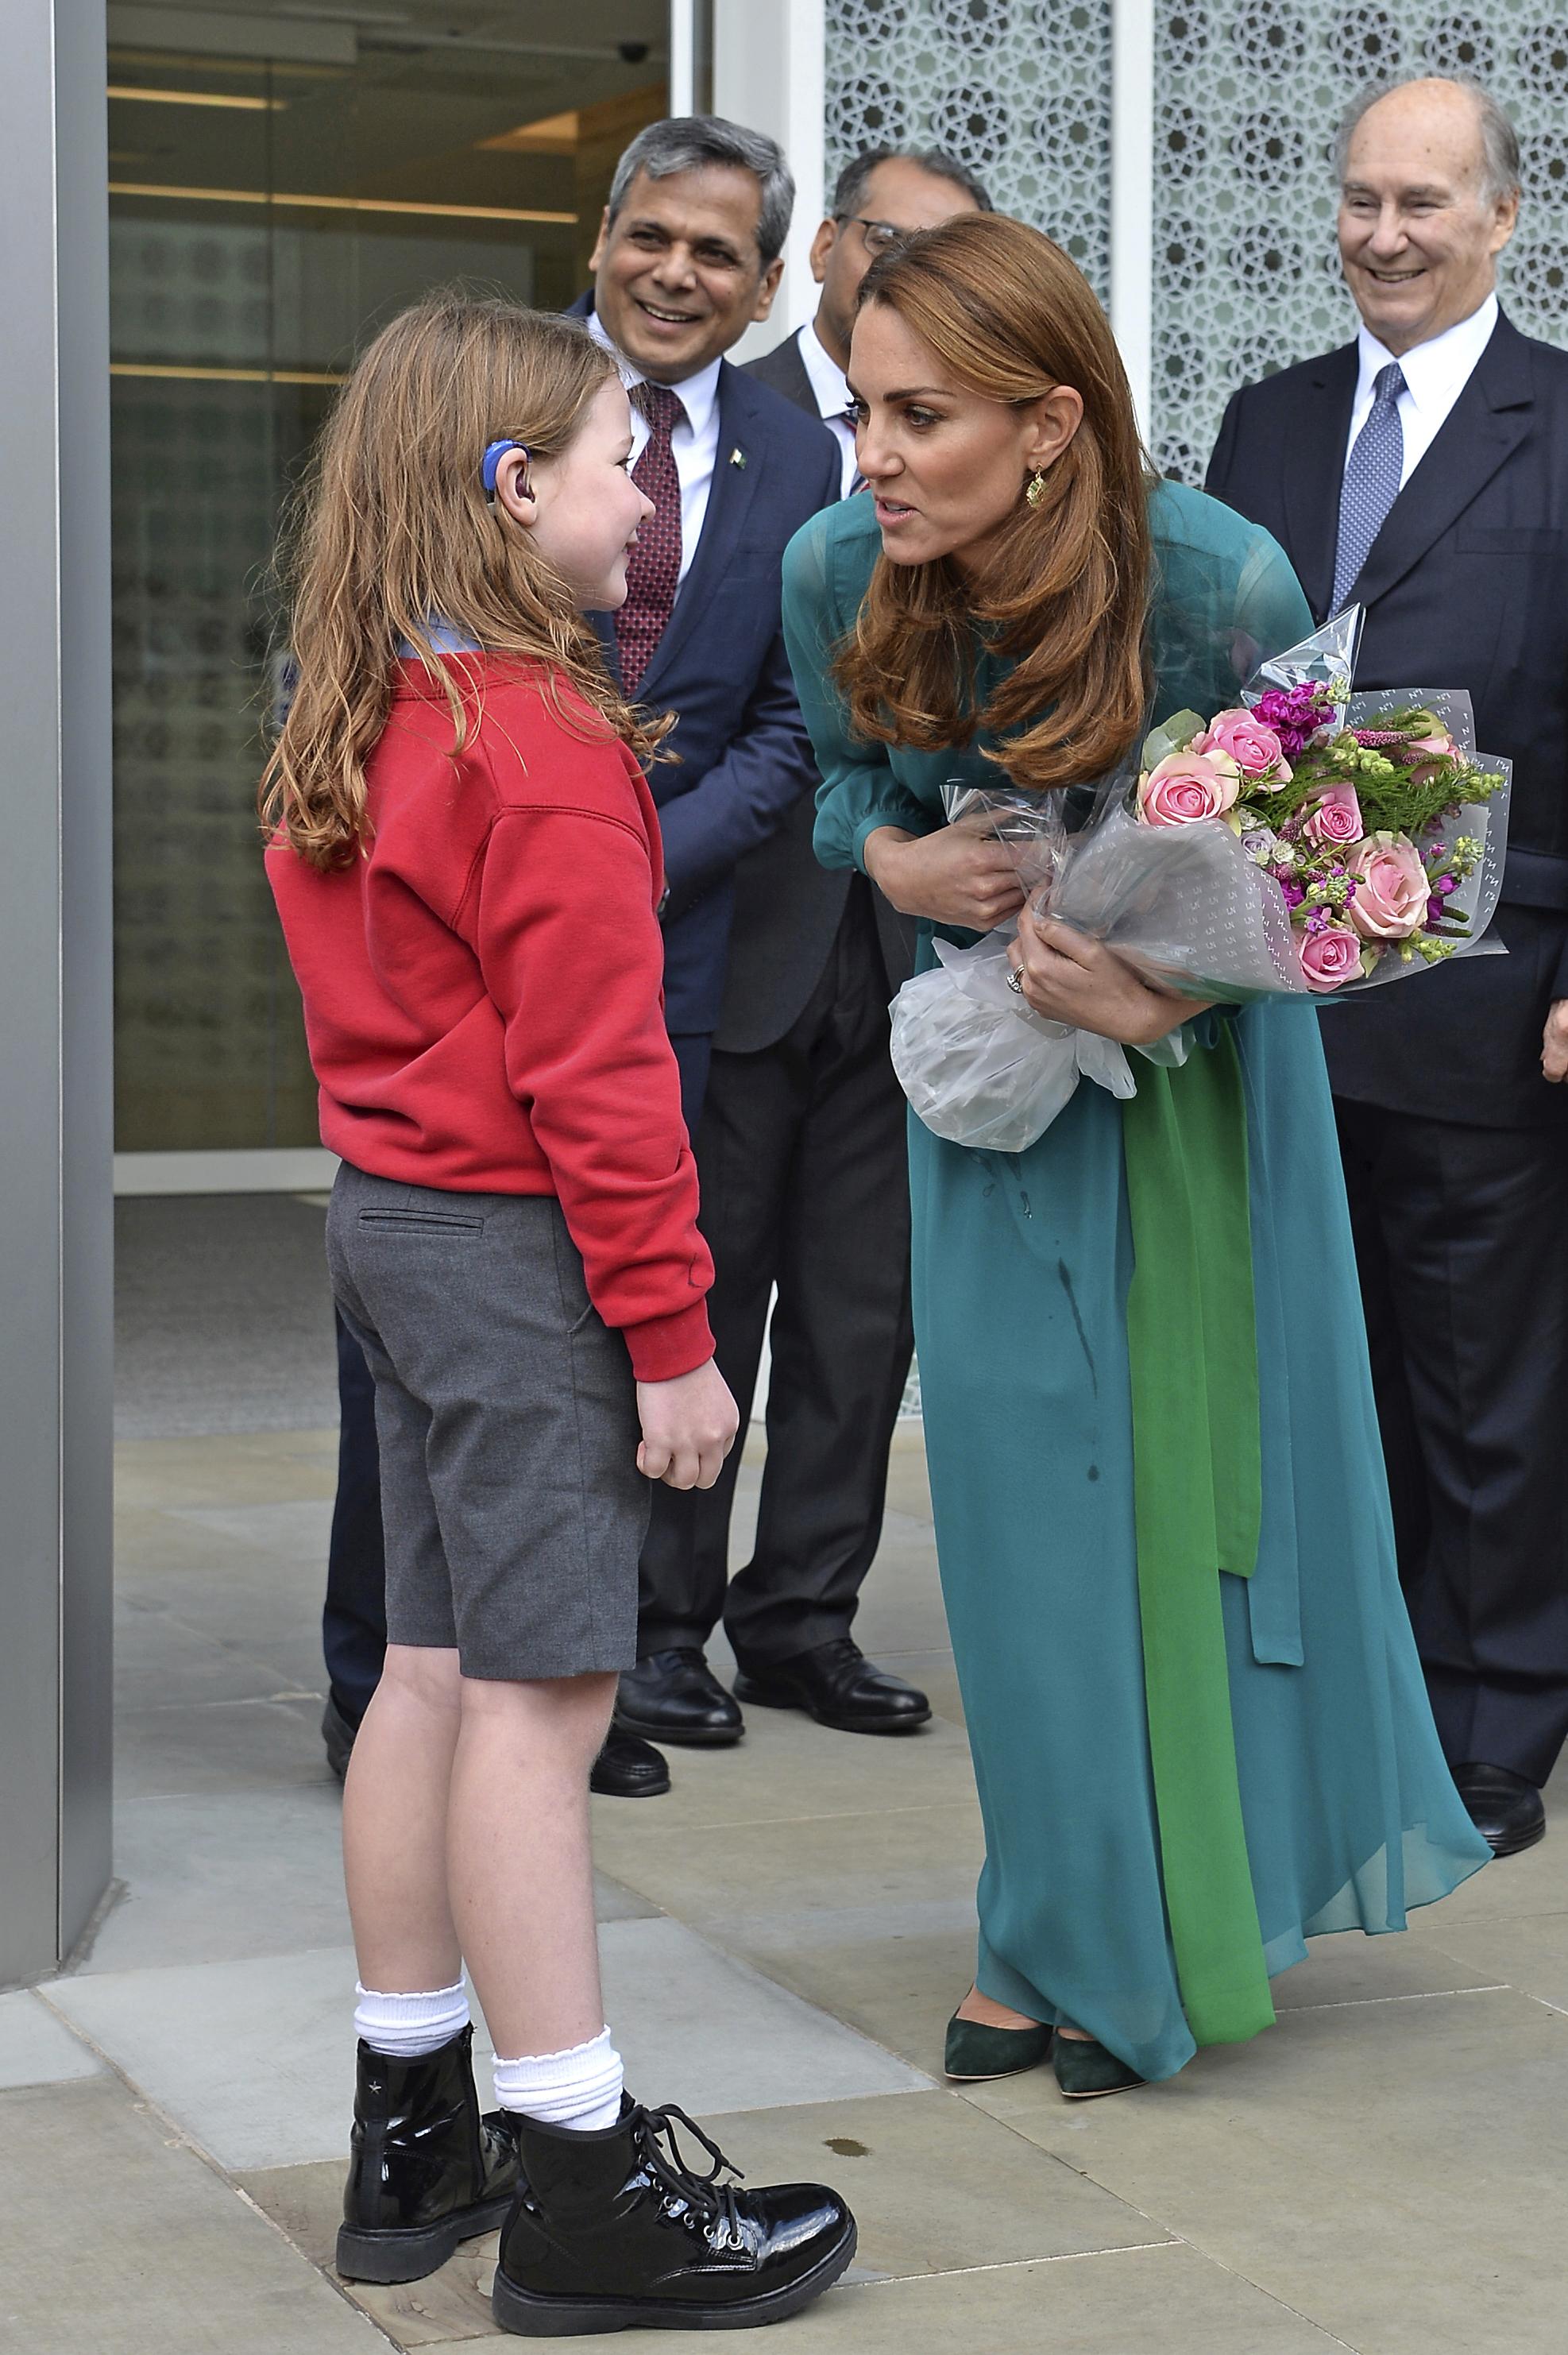 H Kate Middleton φόρεσε τα πιο ωραία σκουλαρίκια και κοστίζουν μόνο 6 Ευρώ!